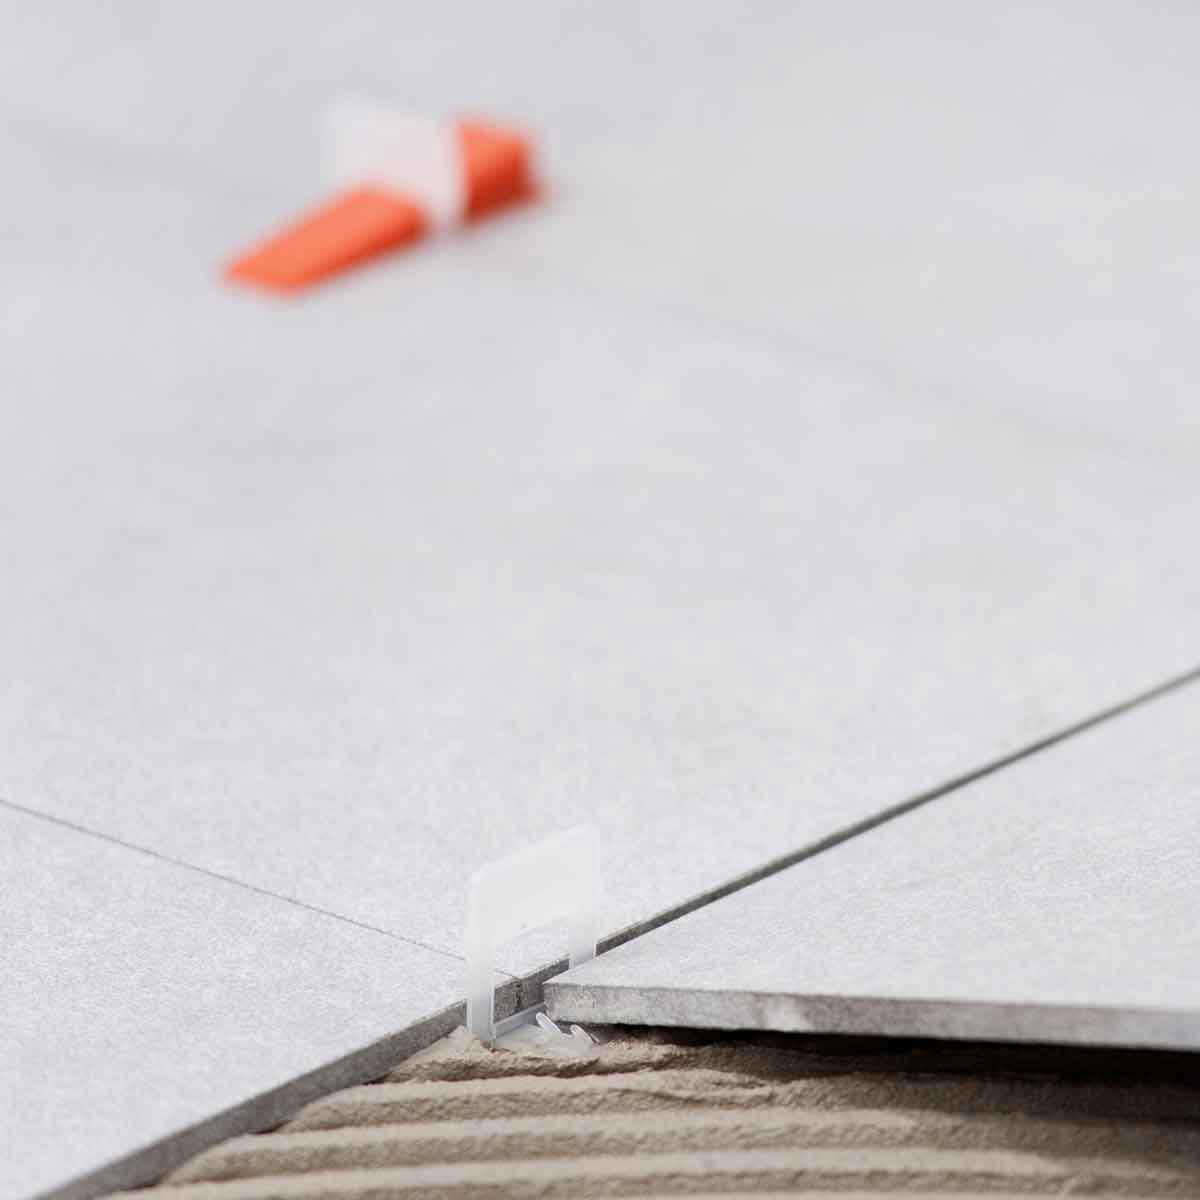 installing raimondi 5/32nd clip with tile